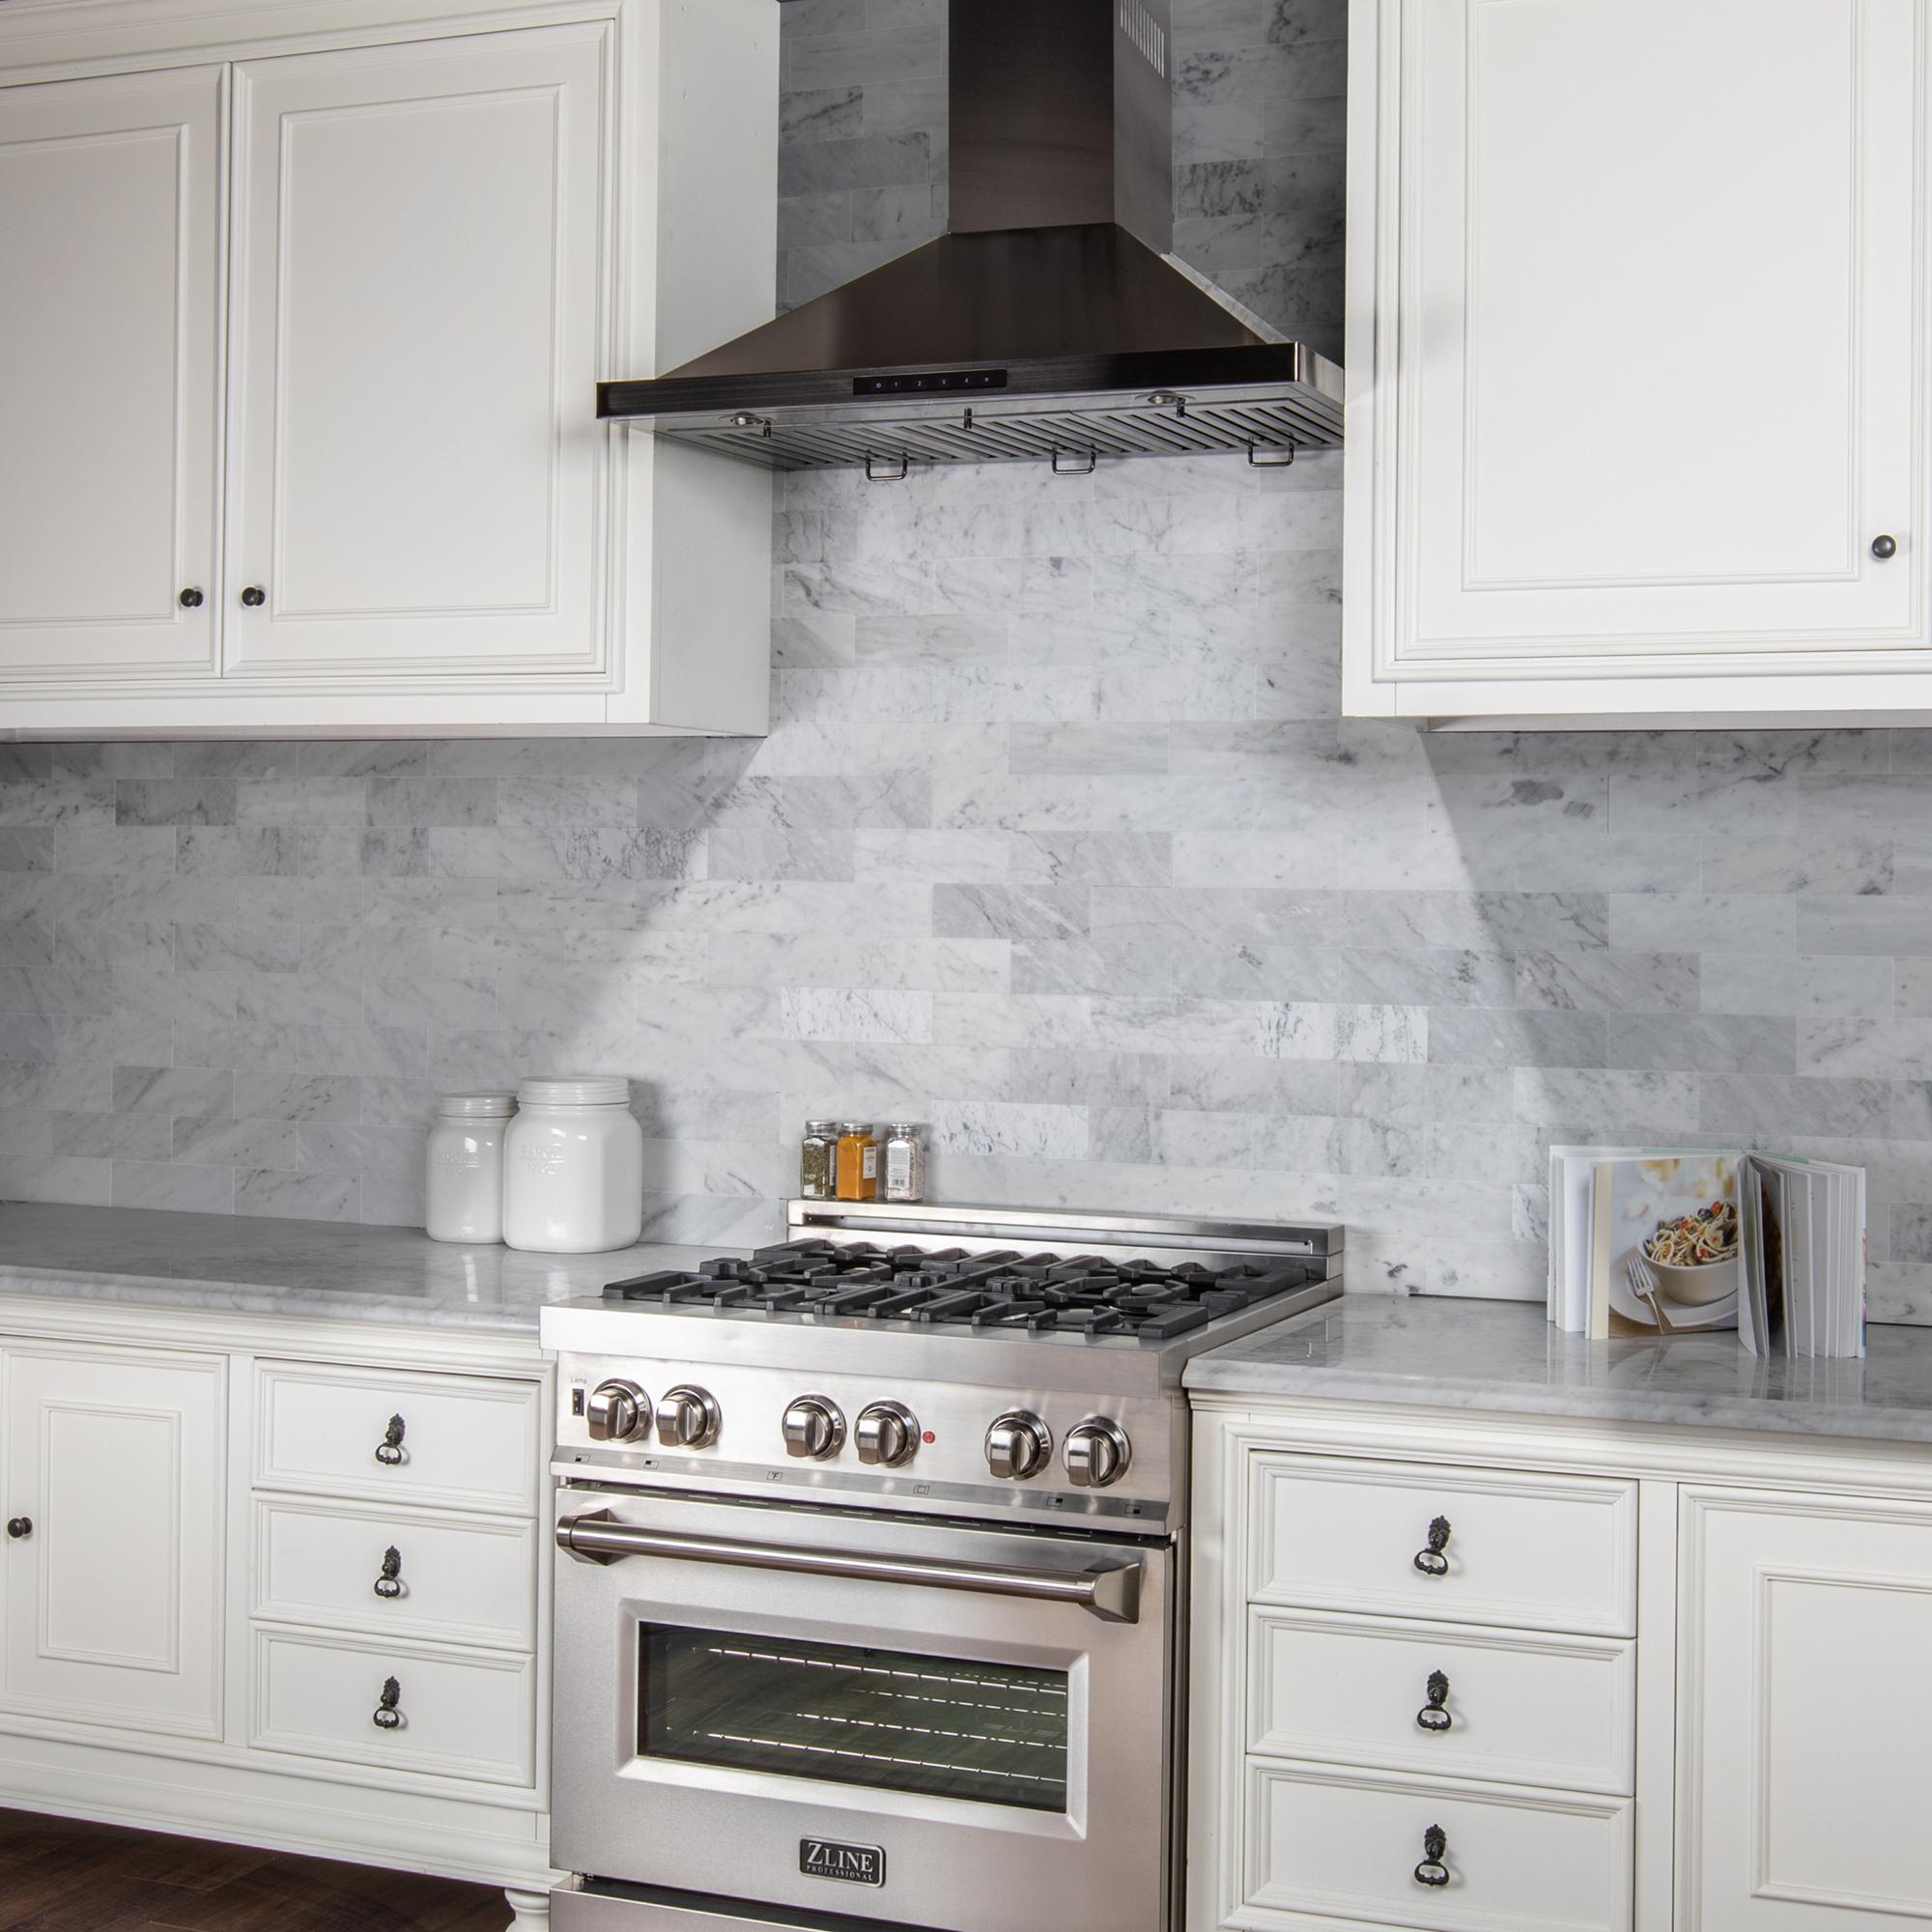 zline-black-stainless-steel-wall-mounted-range-hood-BSKBN_Kitchen2.jpg